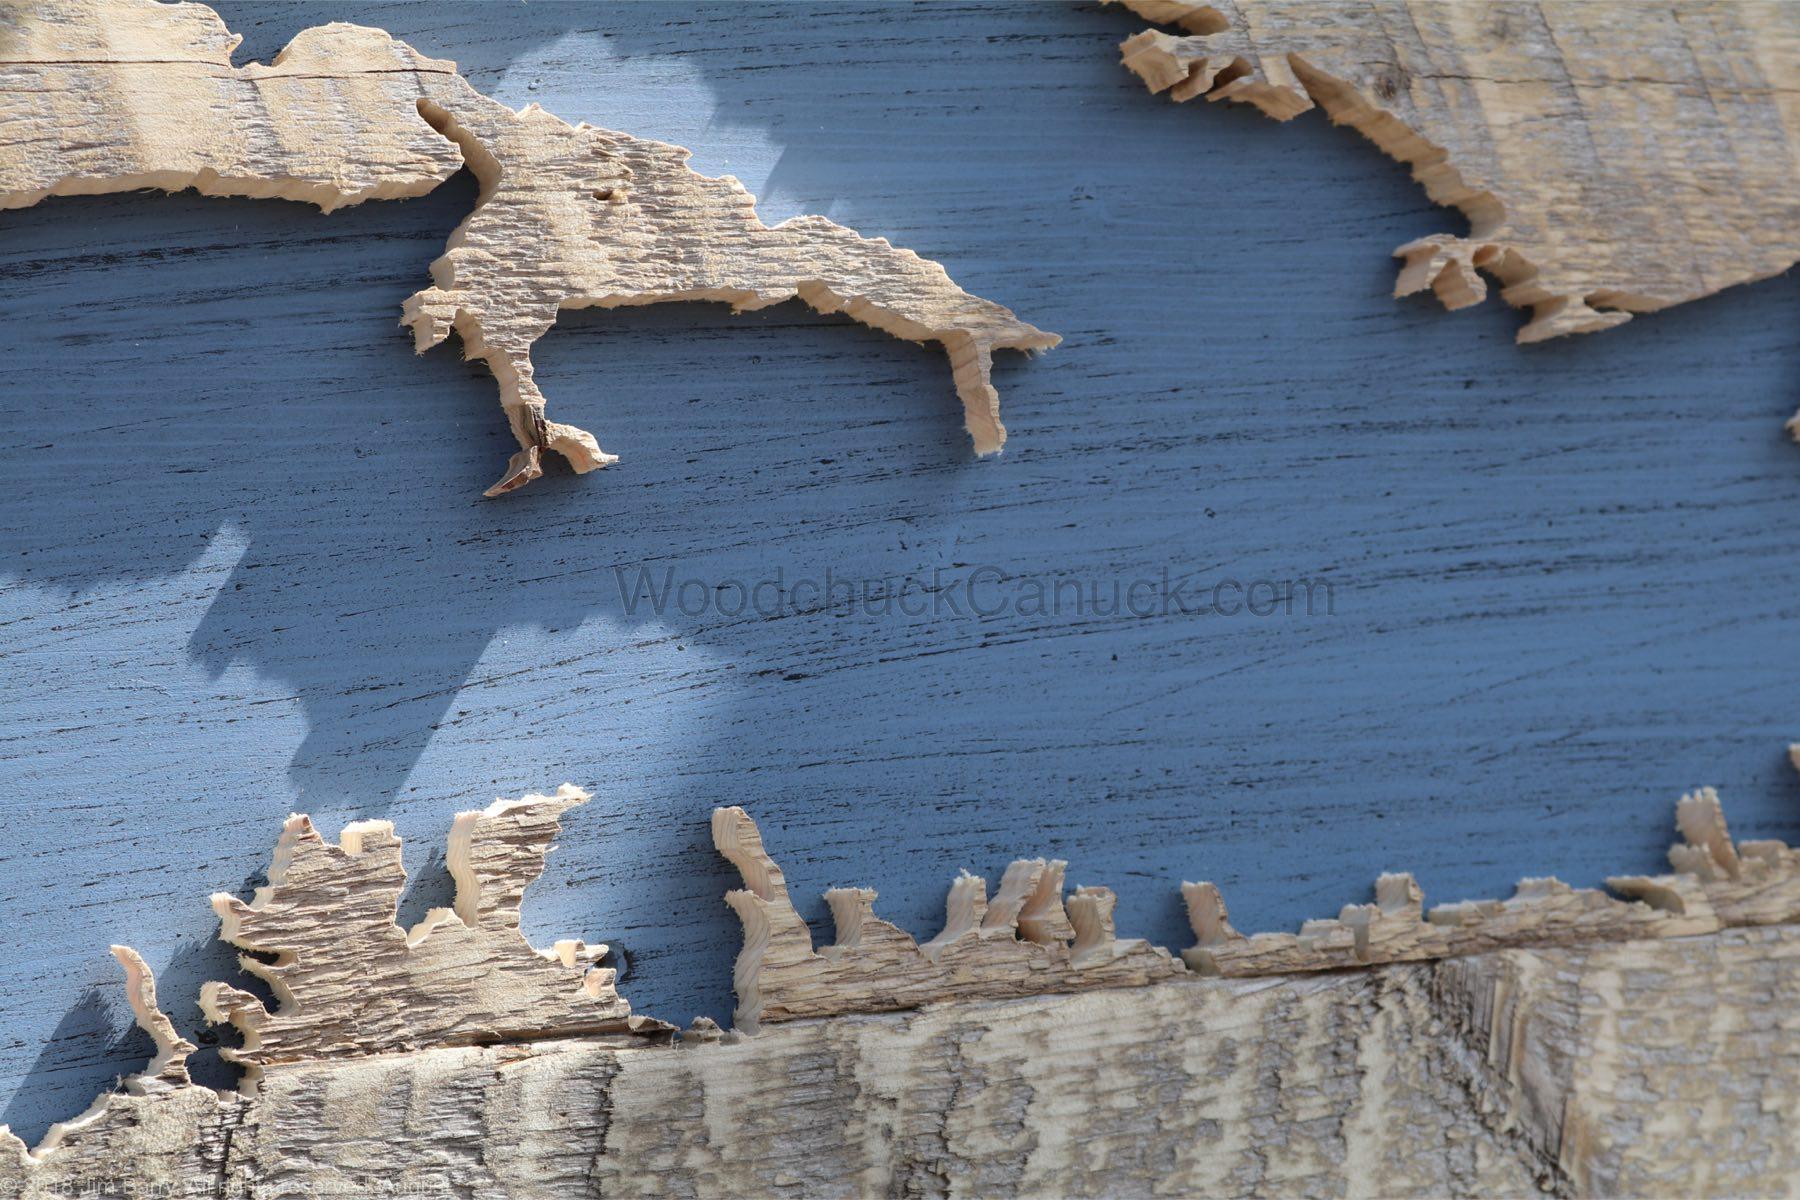 Wood Map of Nova Scotia #64 - WoodchuckCanuck.com